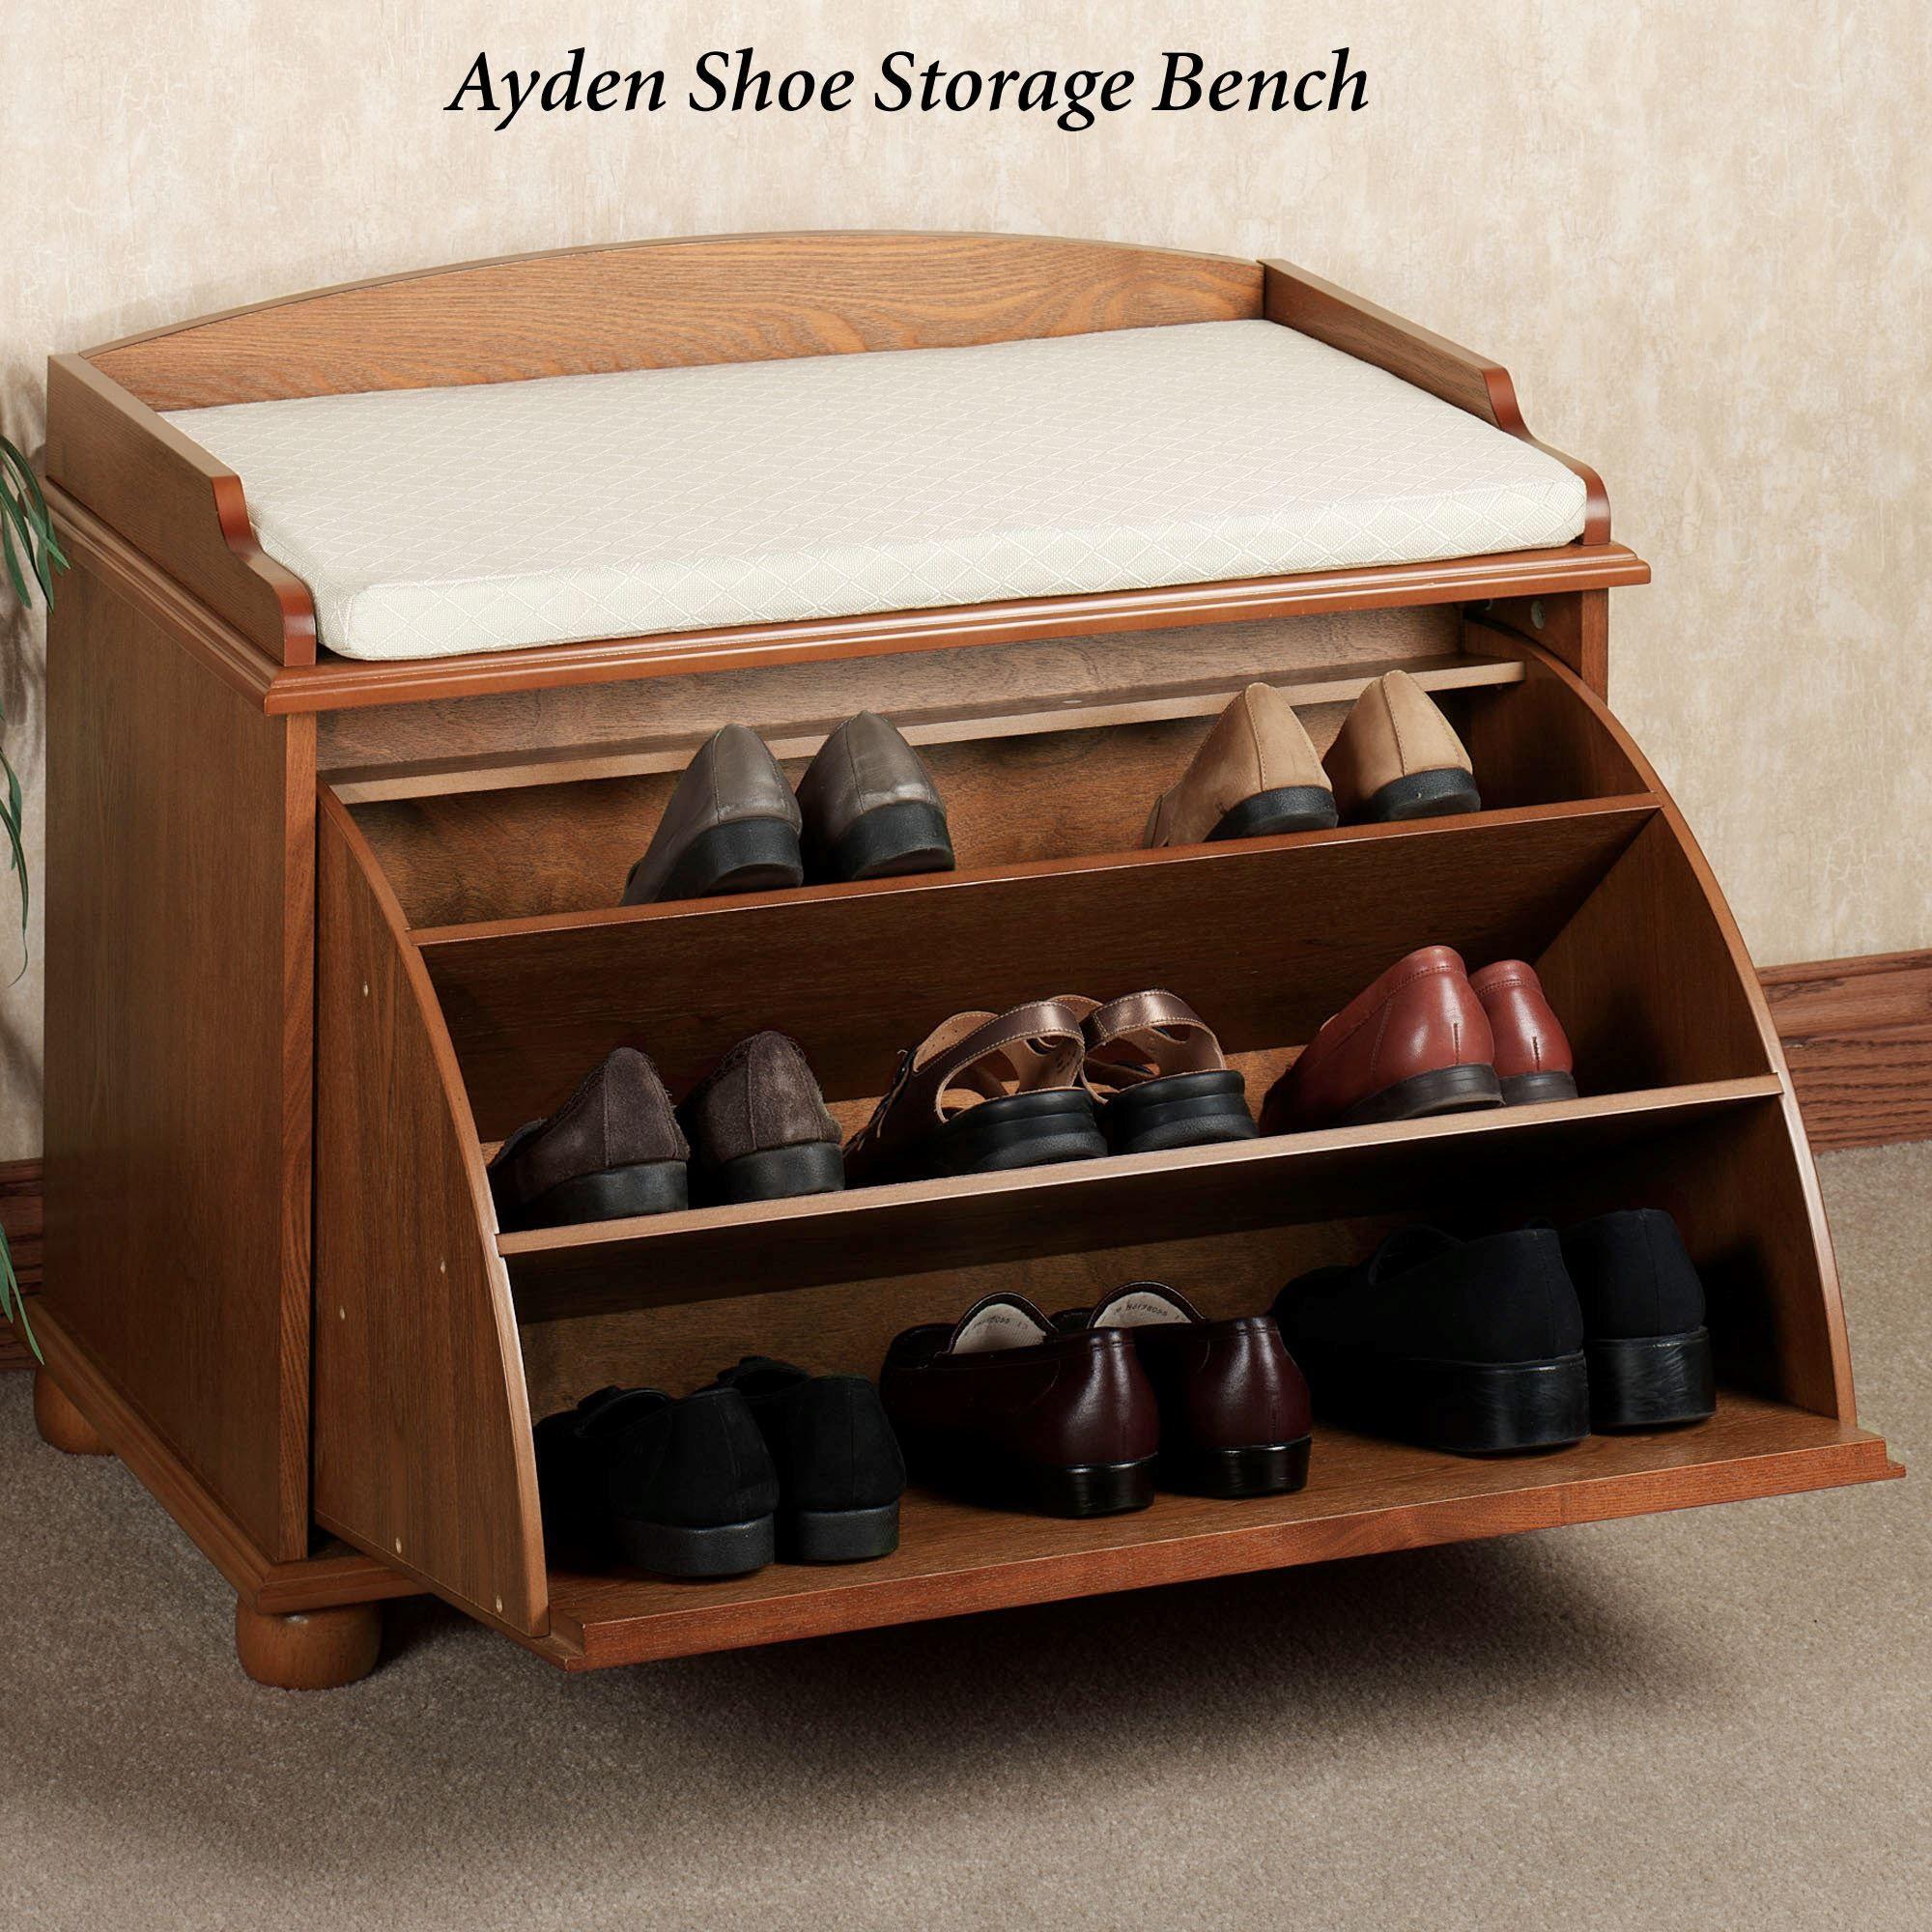 Amazing Aubrie Shoe Storage Bench Classic Cherry